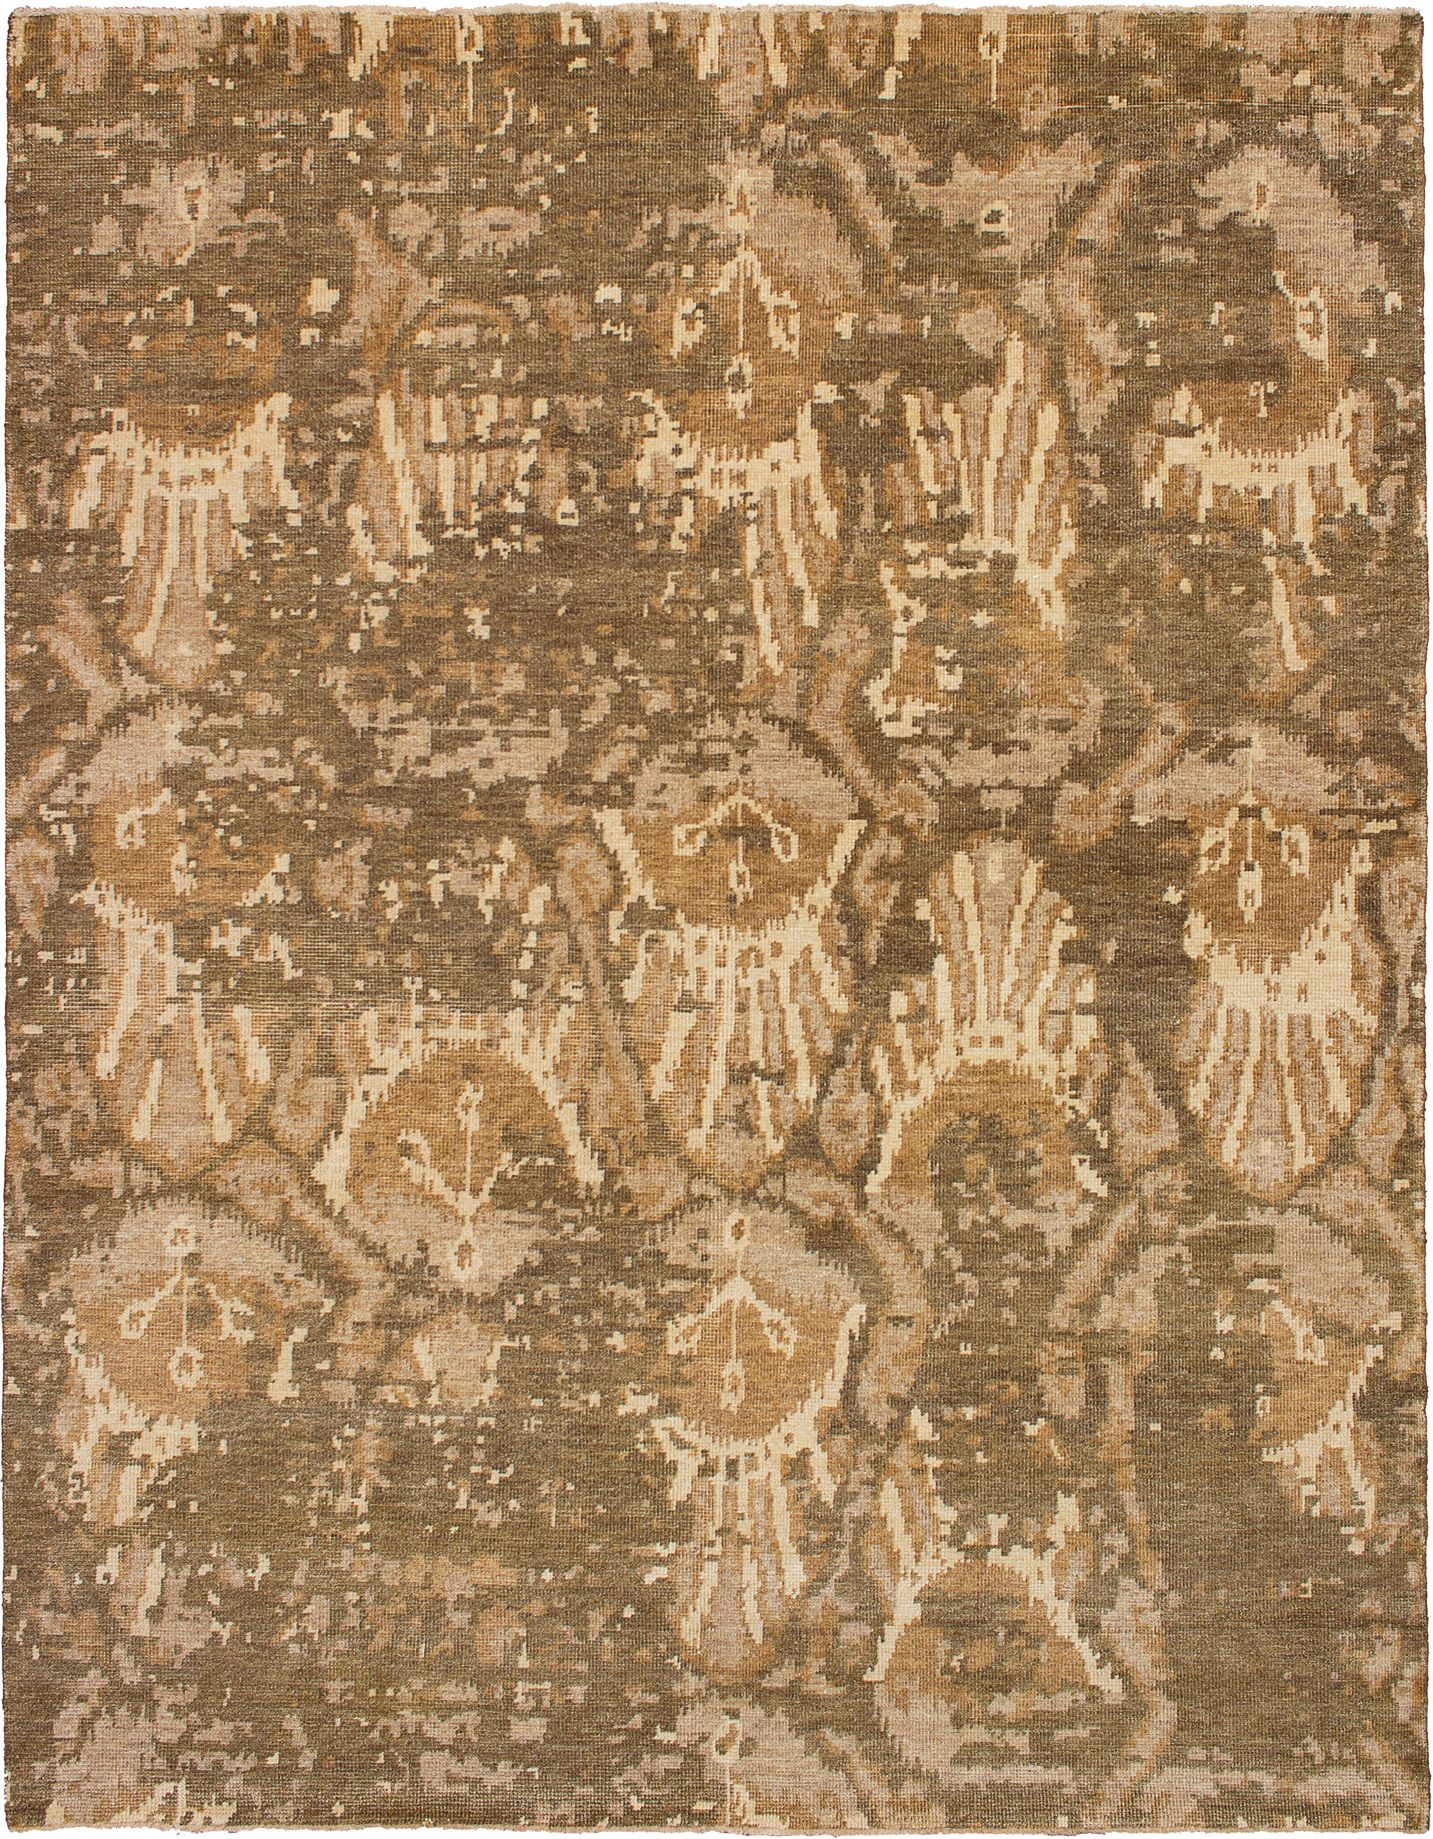 "Hand-knotted Elixir Dark Brown Wool Rug 7'7"" x 9'9"" Size: 7'7"" x 9'9"""